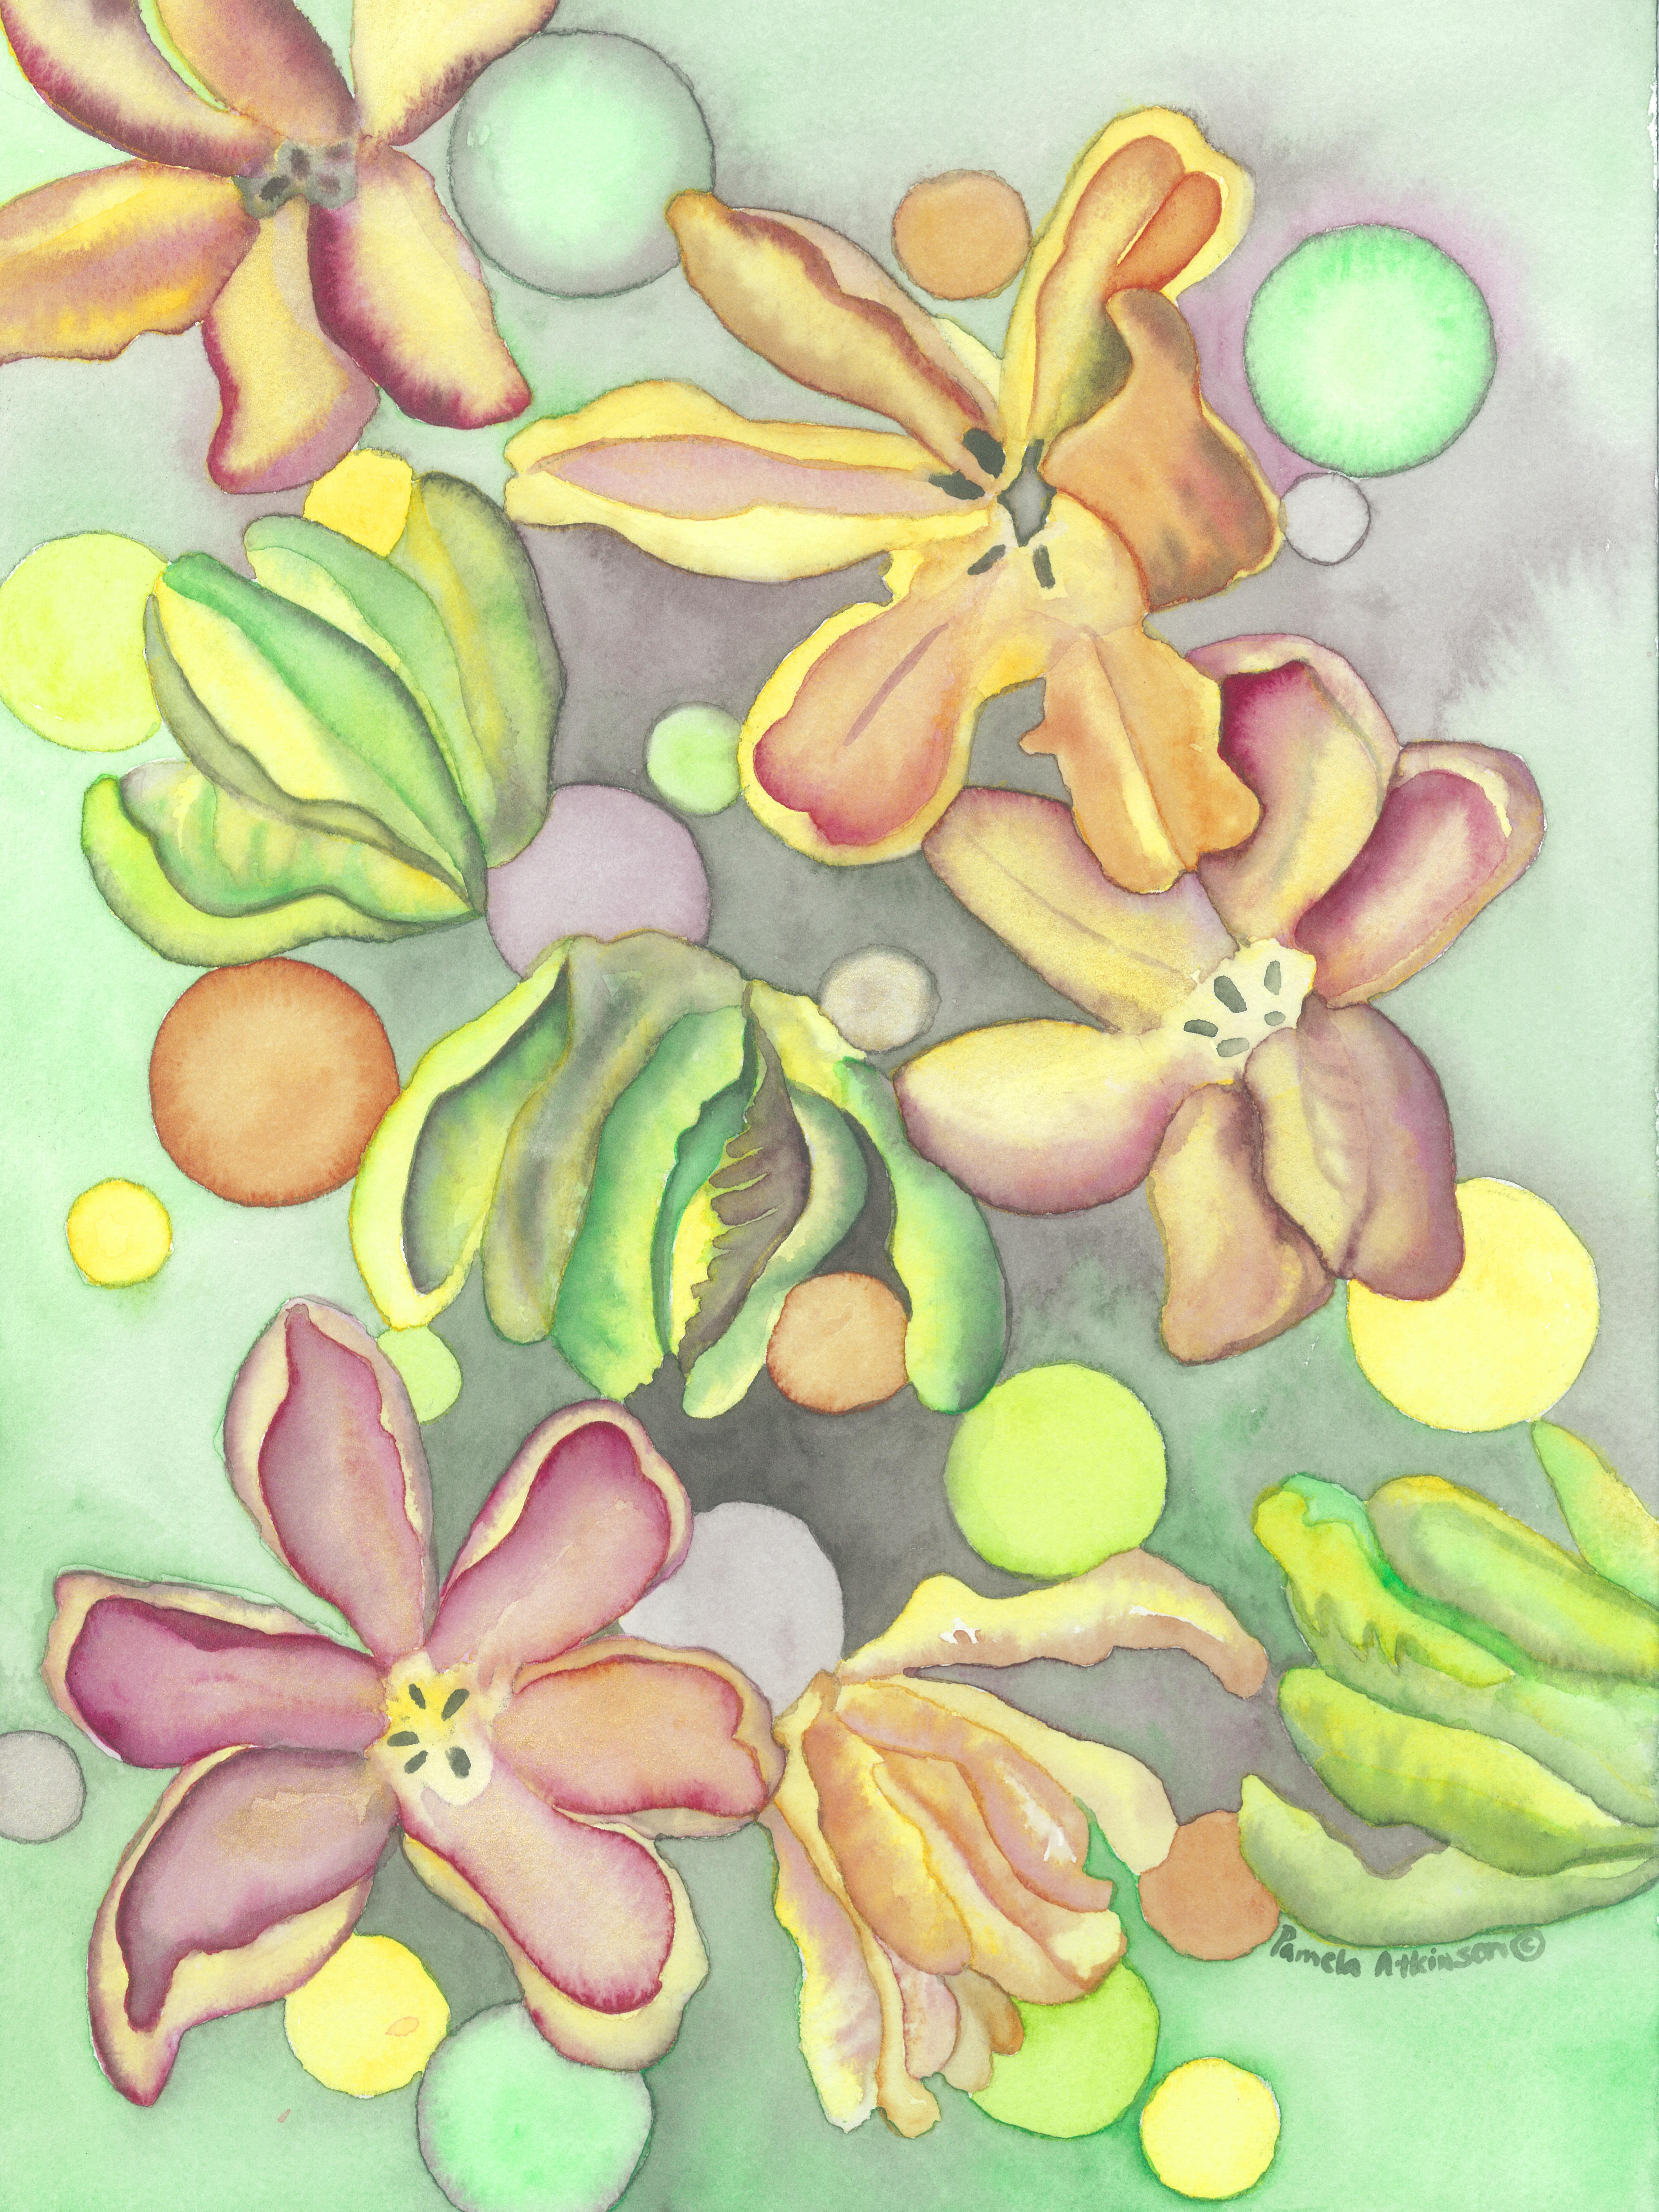 Watercolor, Tulip Moon #1, ©2018, Pamela Atkinson, Pam Atkinson, pamelaatkinson.net, painting, Energy, Flowers, Beauty, Visual Arts, Southern CA